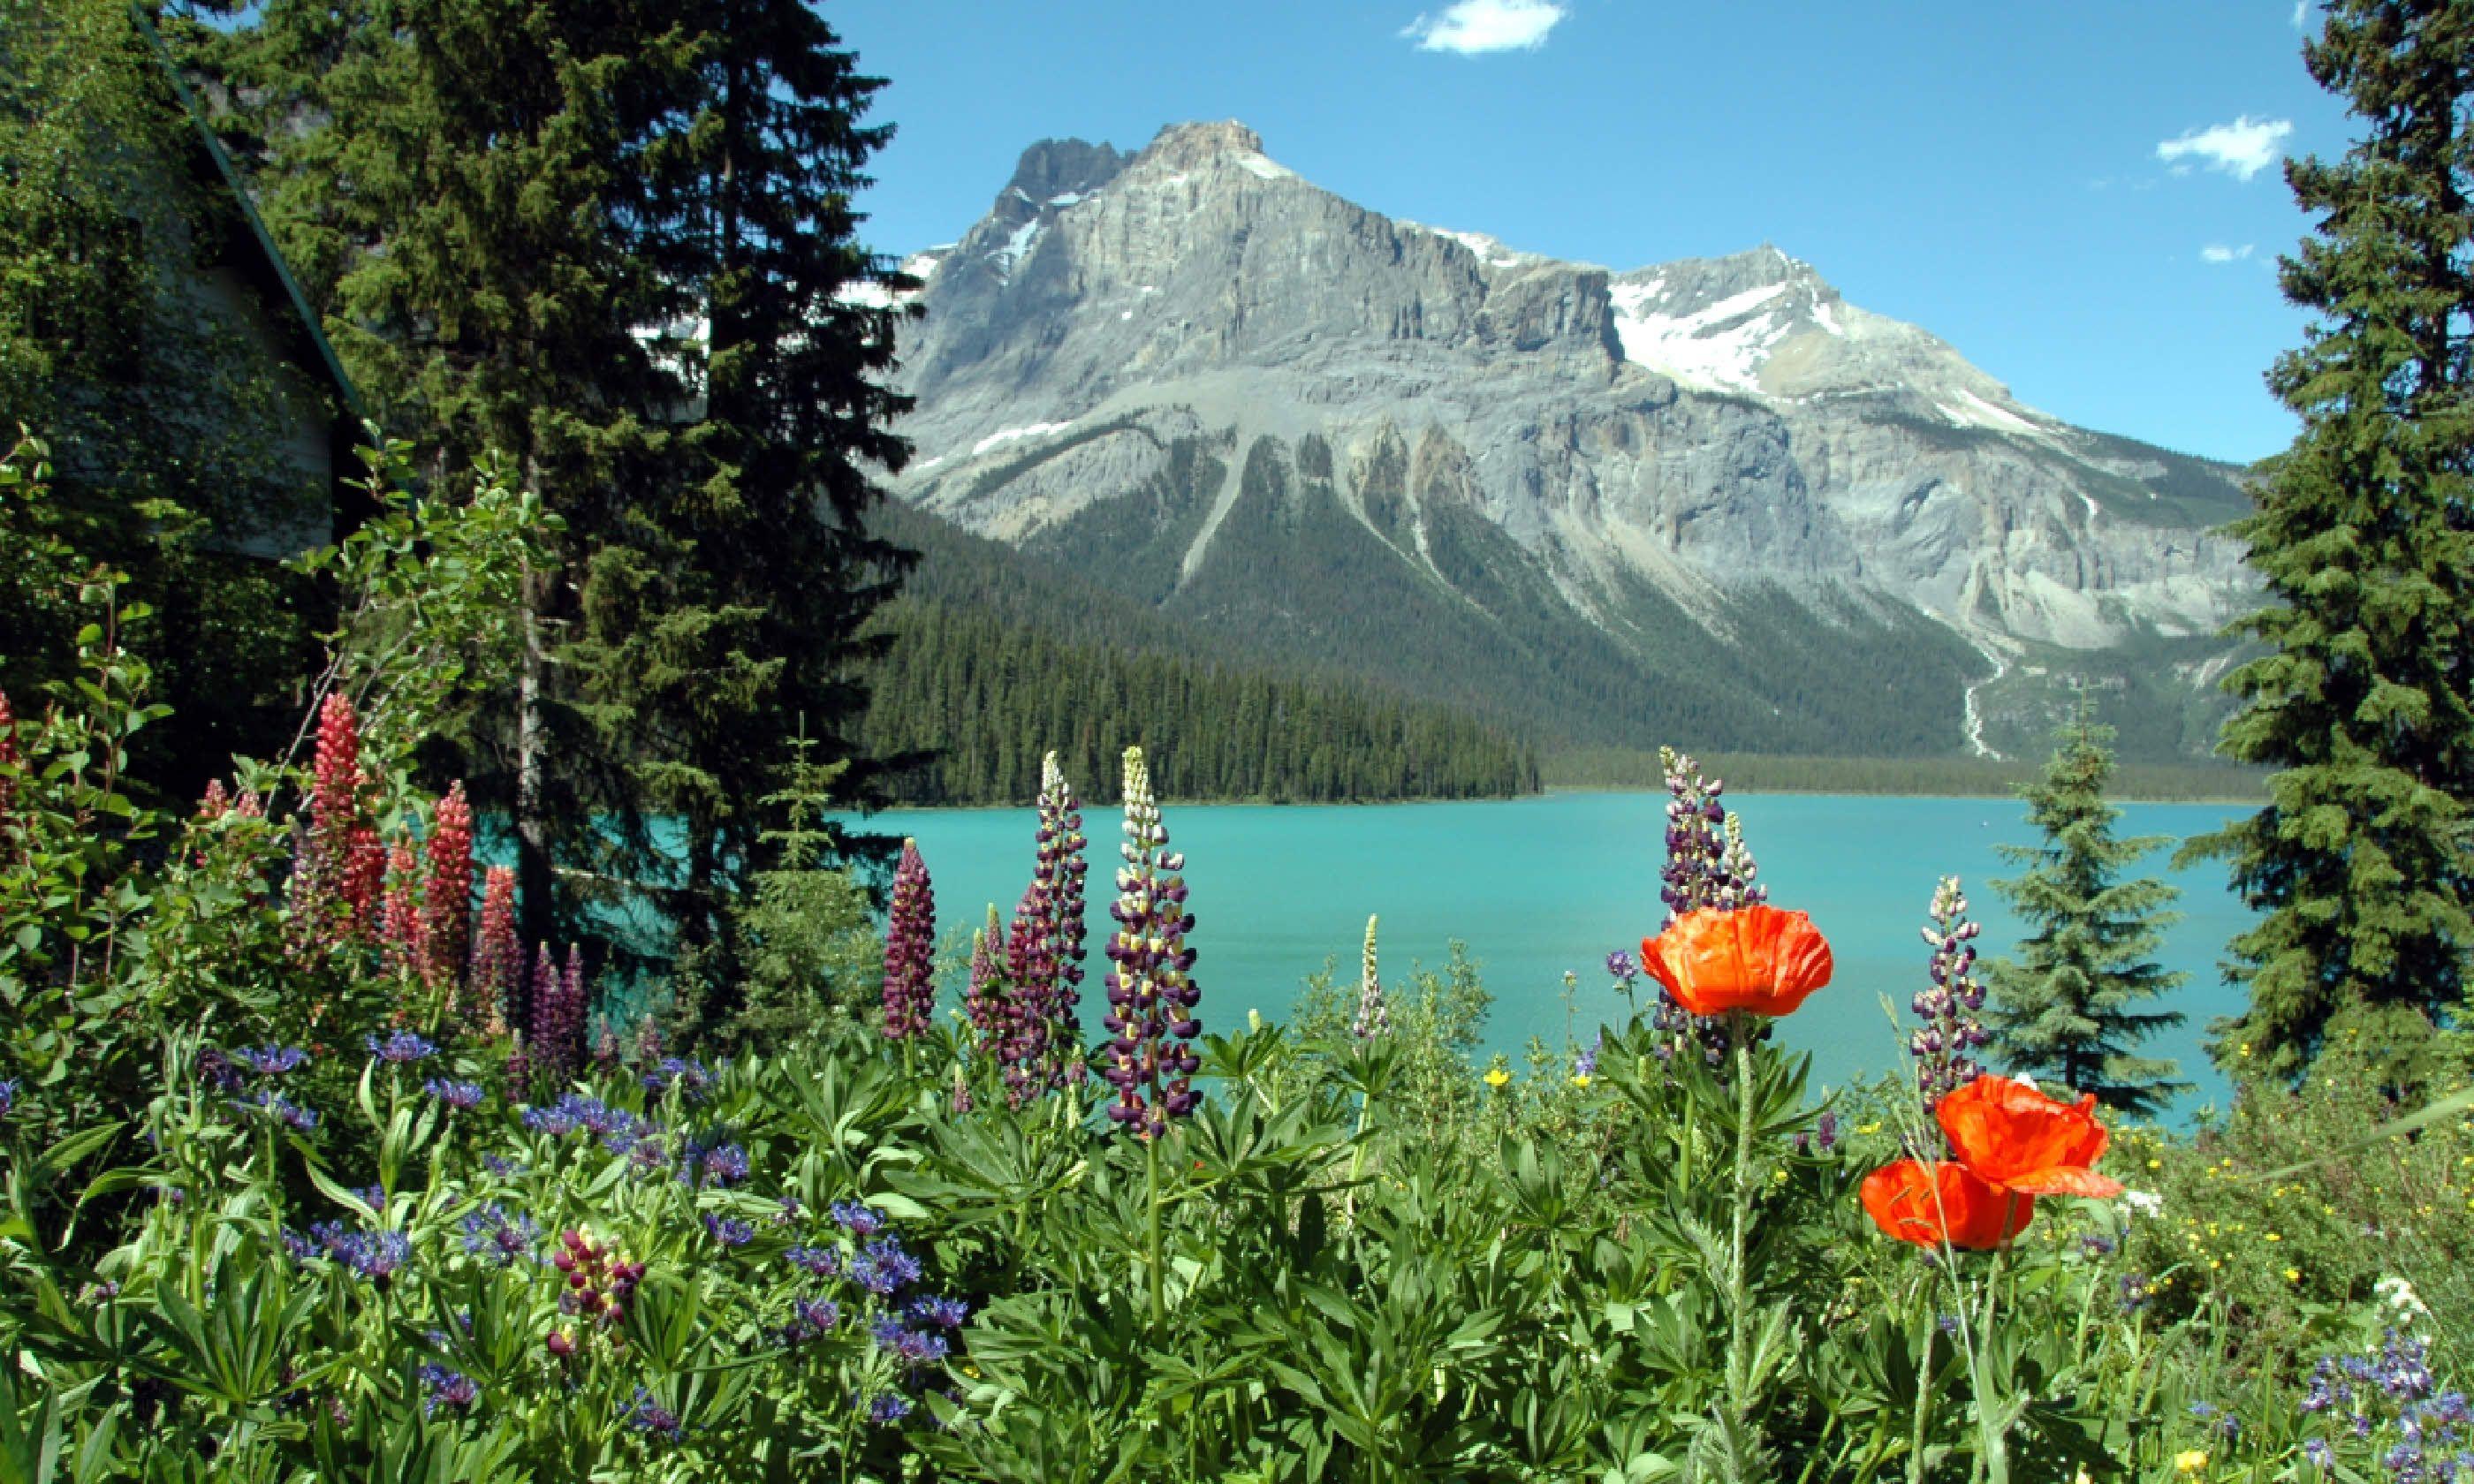 Flowers bordering Emerald Lake, BC (Shutterstock)